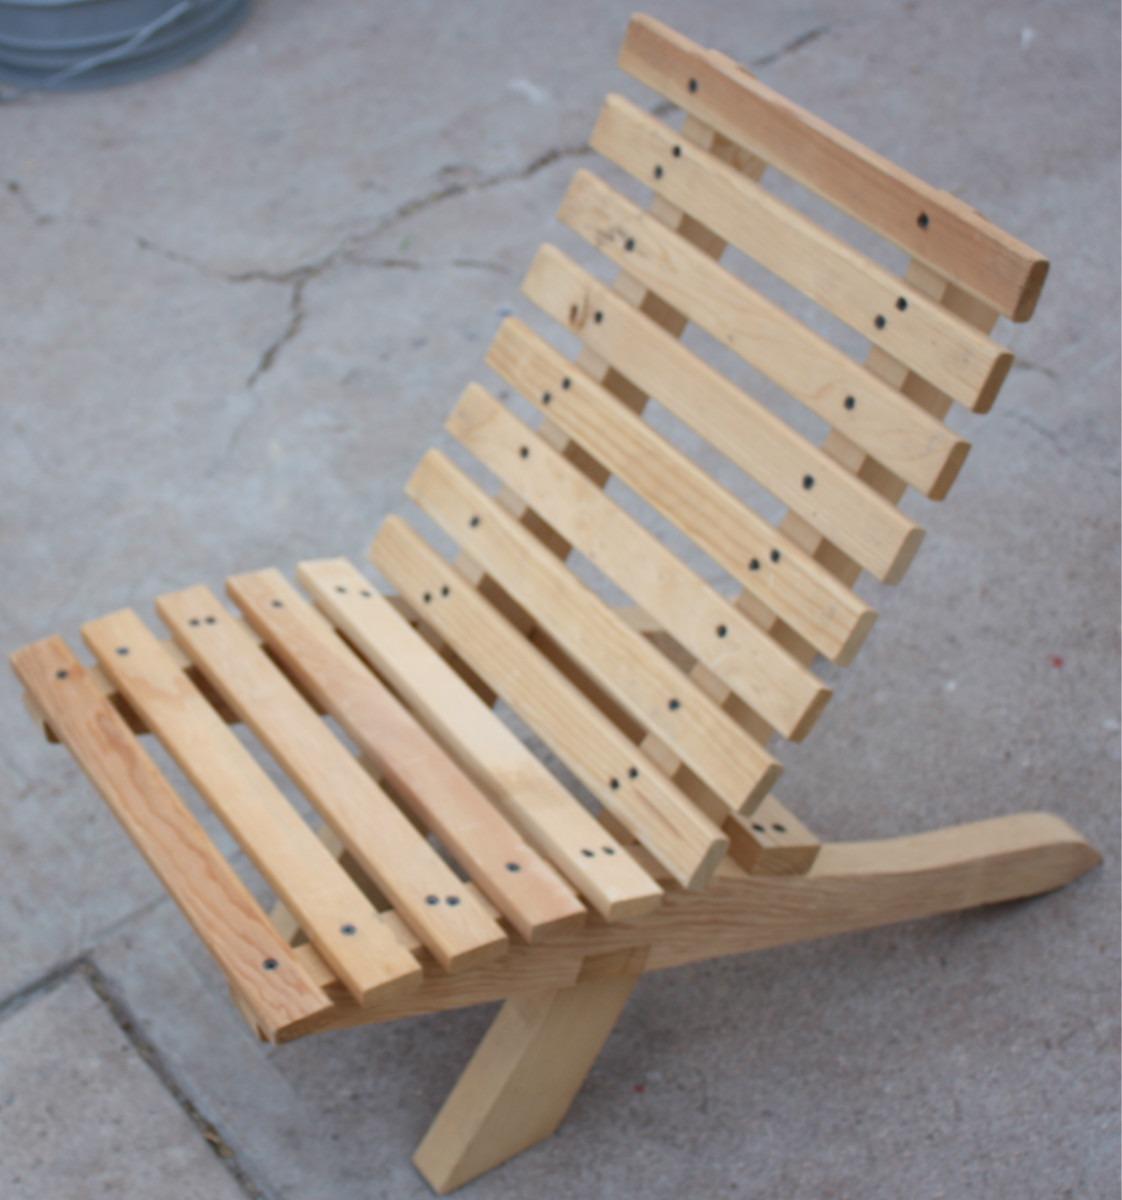 Silla Para Nio Mueble Plegable Madera Jardin O Interiores